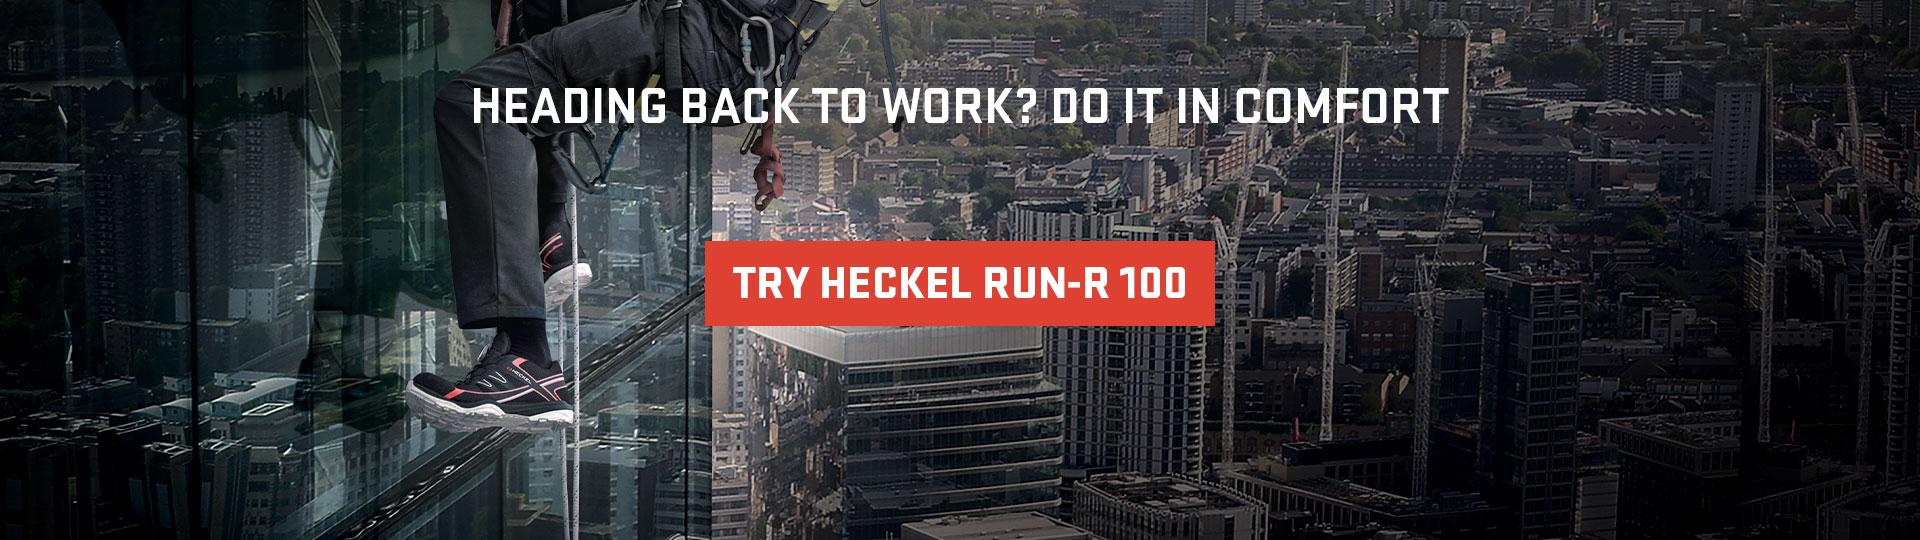 Try Heckel Run-R 100